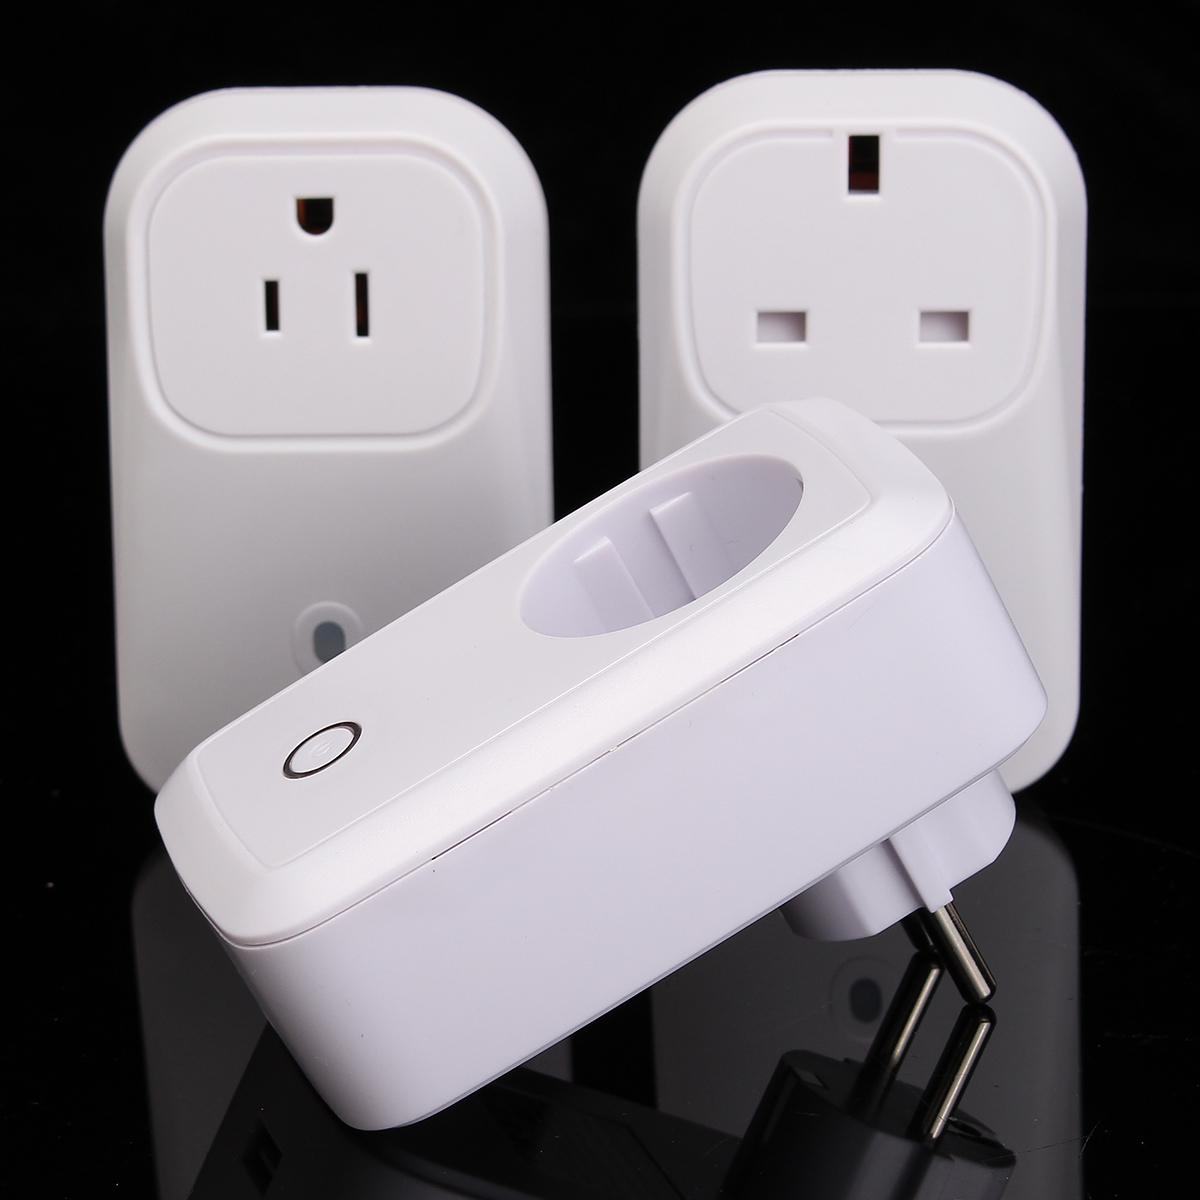 NEW WiFi Wireless Smart Power Socket Android/iOS Mobile Phone Remote Control Repeater US Plug/EU Plug/UK Plug